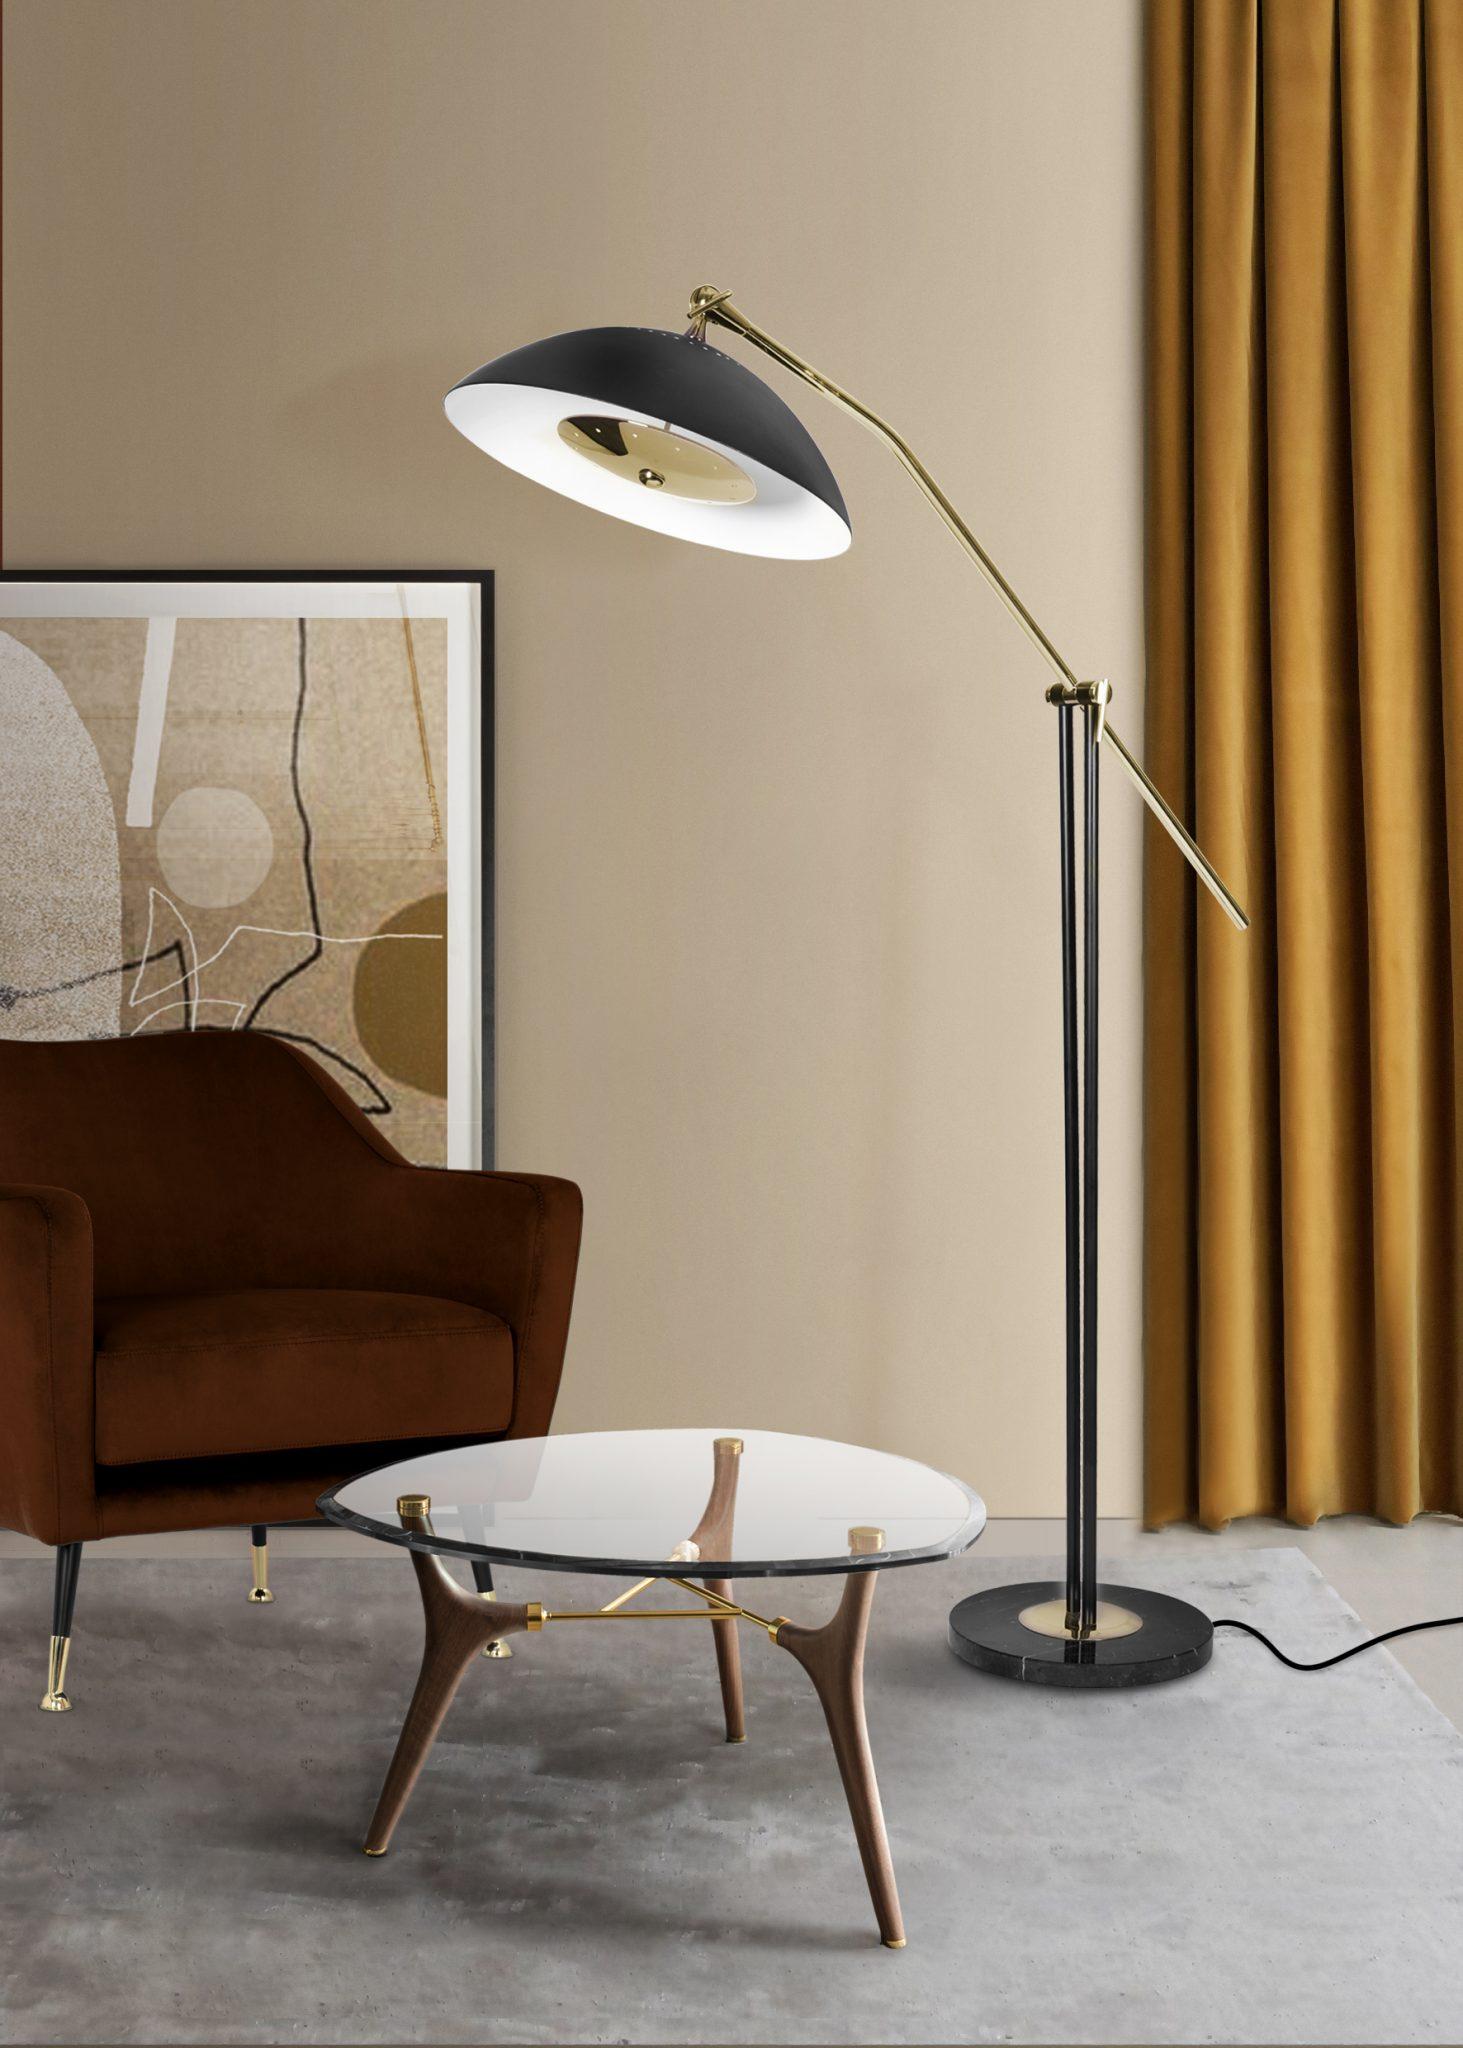 MINIMALIST LIGHTING DESIGN FOR YOUR LIVING ROOM